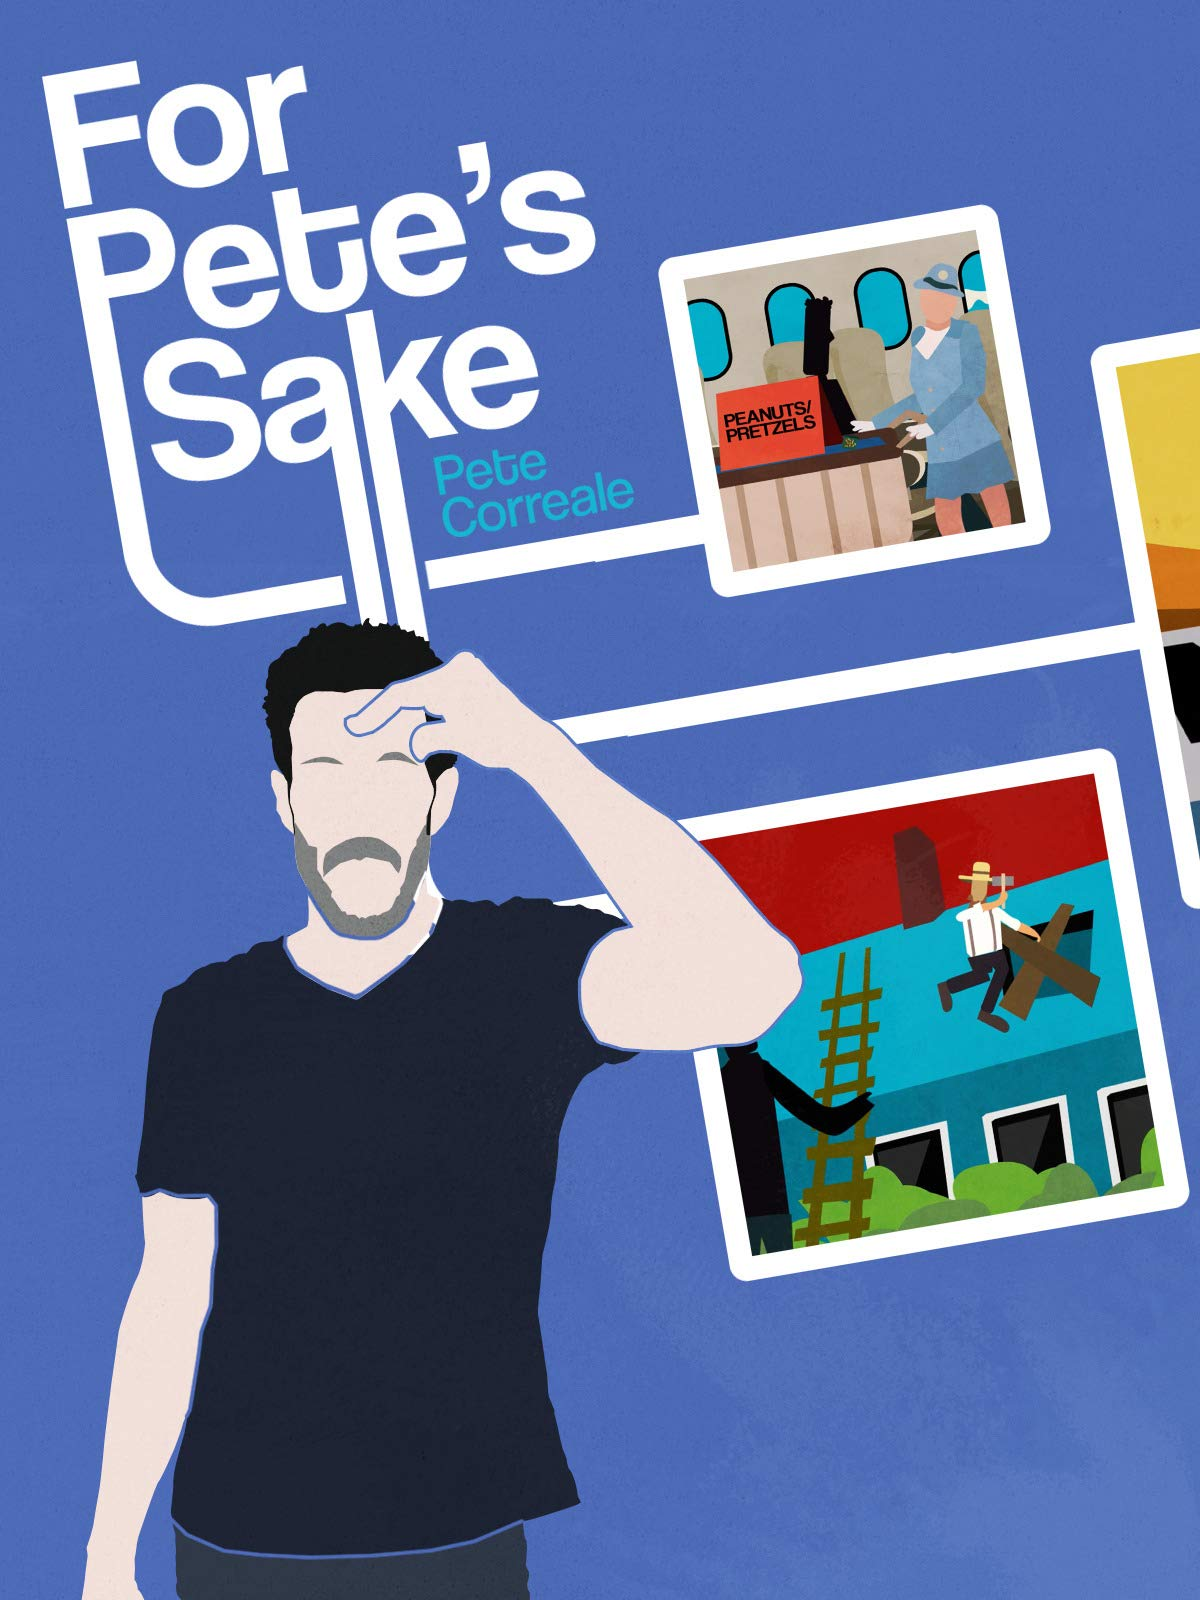 Pete Correale: For Pete's Sake on Amazon Prime Video UK